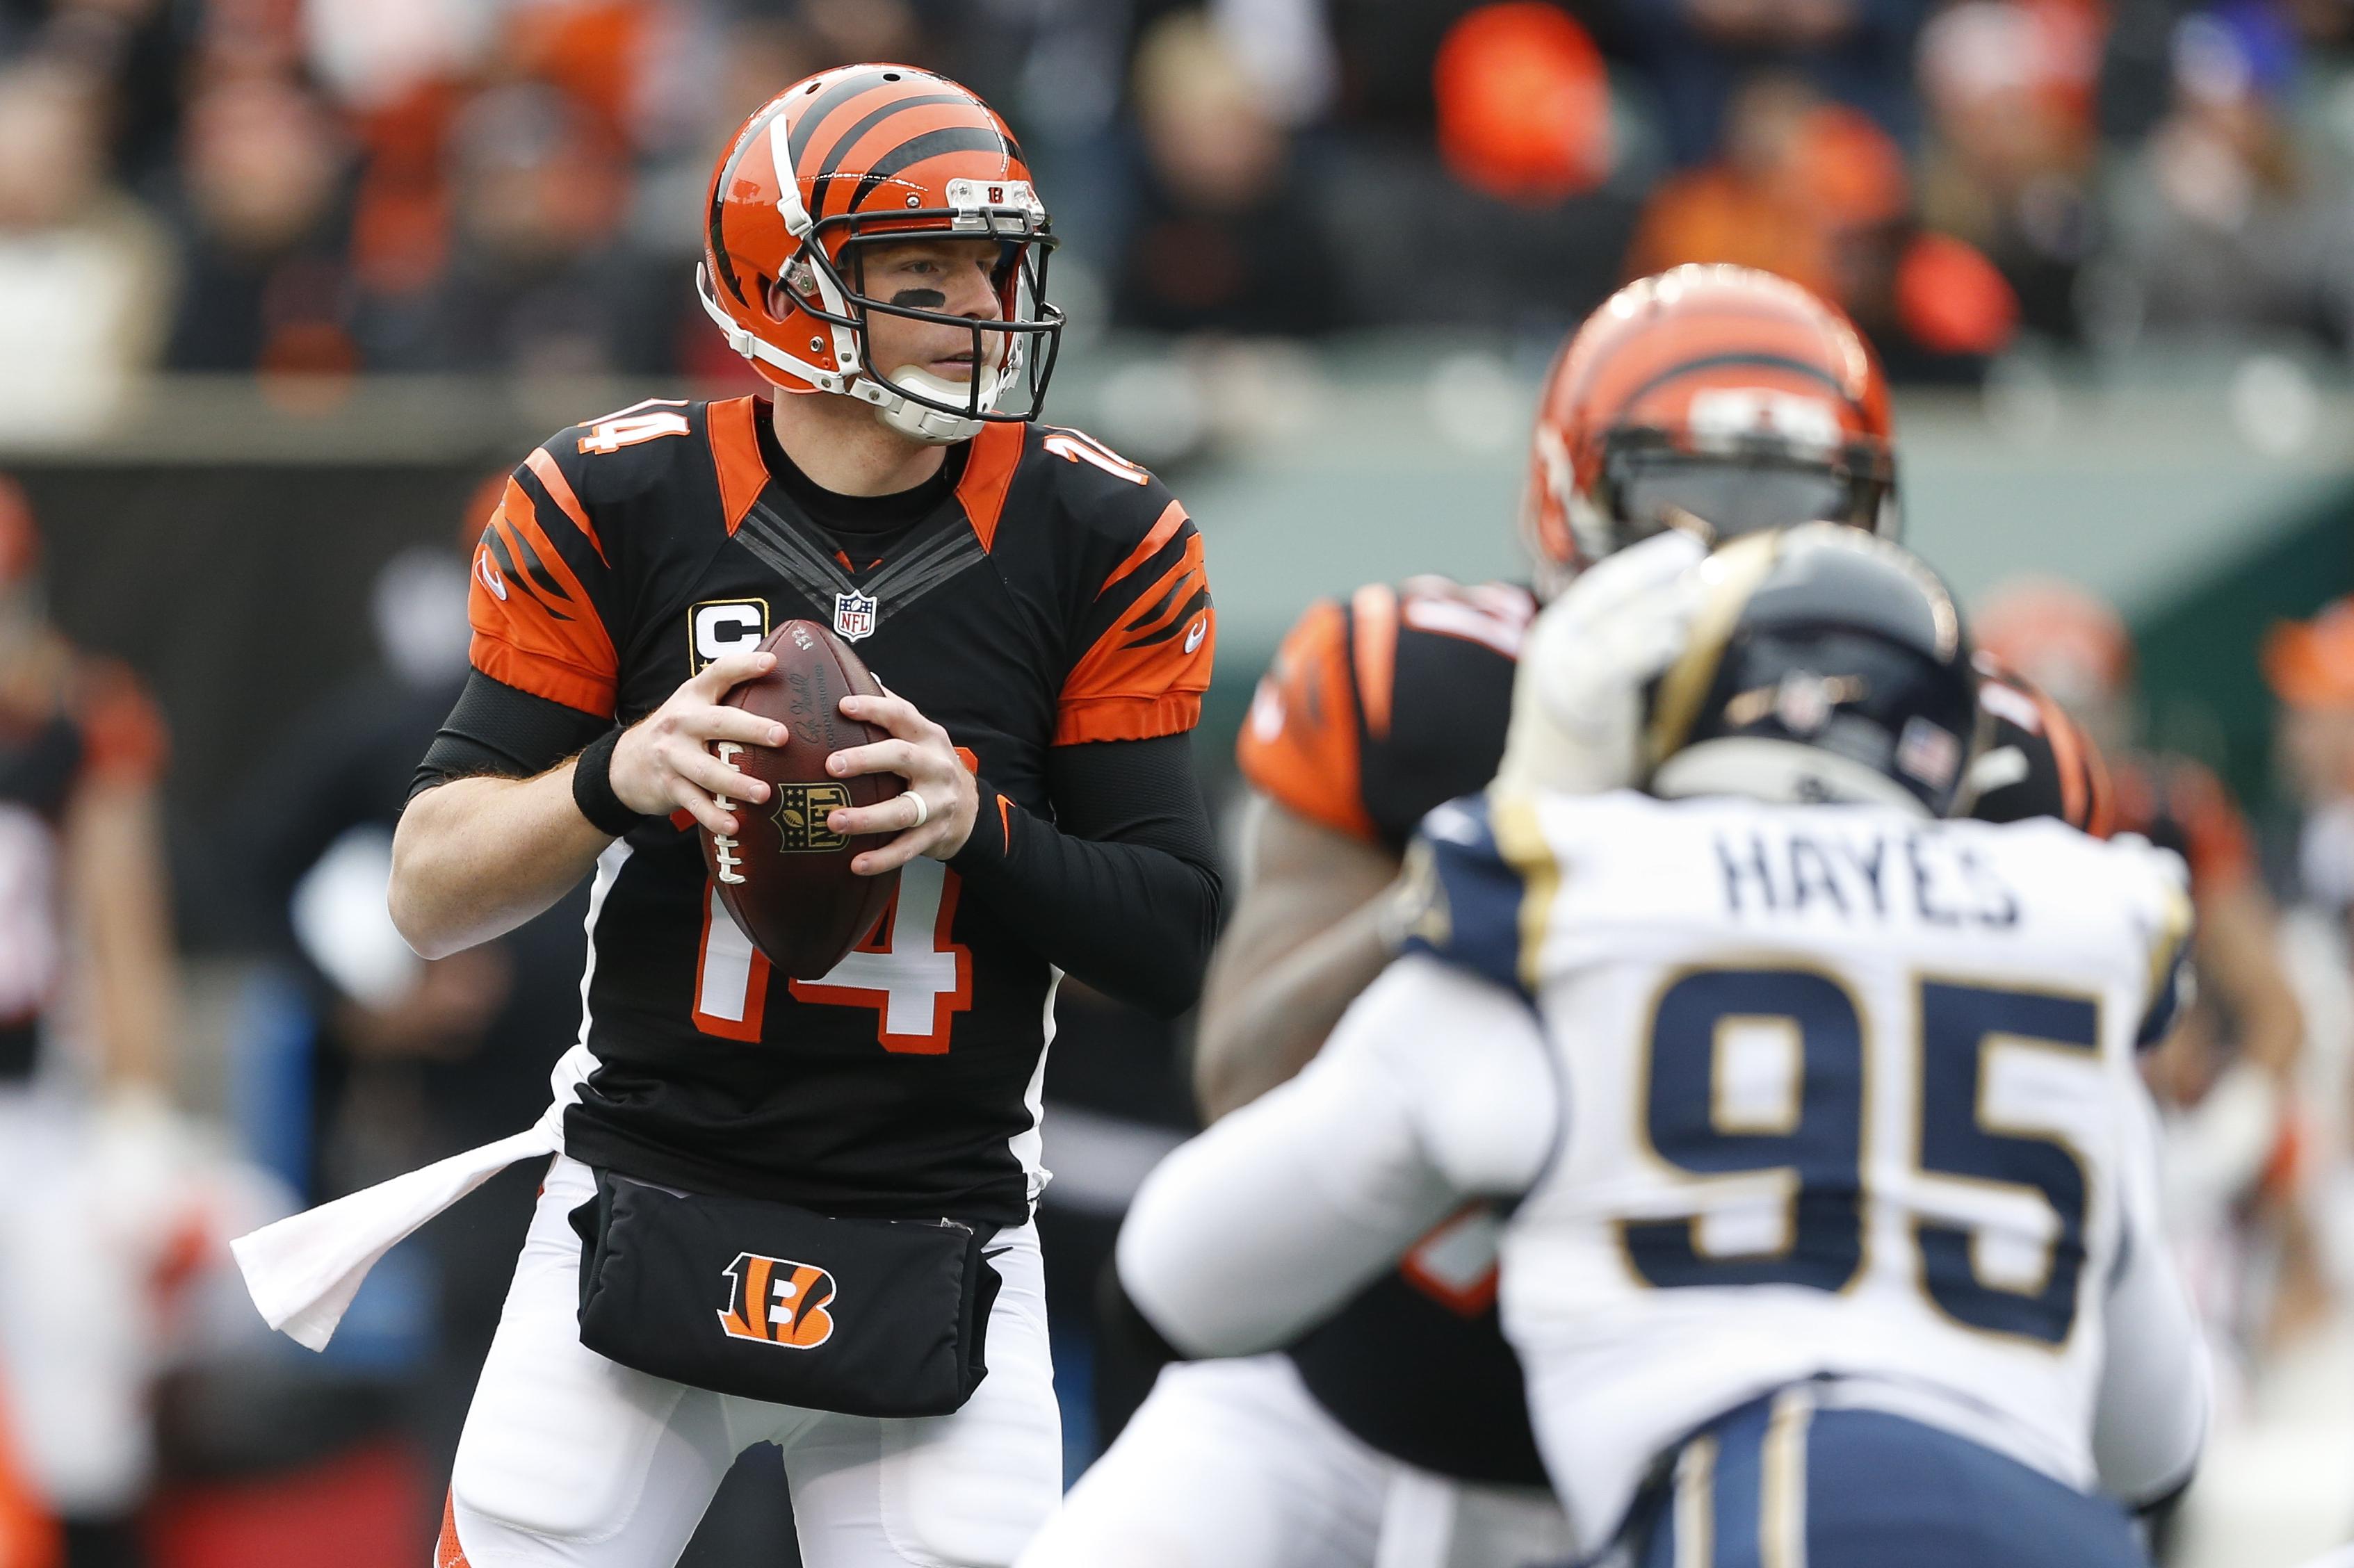 Cincinnati Bengals quarterback Andy Dalton (14) looks to pass in the first half of an NFL football game against the St. Louis Rams, Sunday, Nov. 29, 2015, in Cincinnati. (AP Photo/Gary Landers)